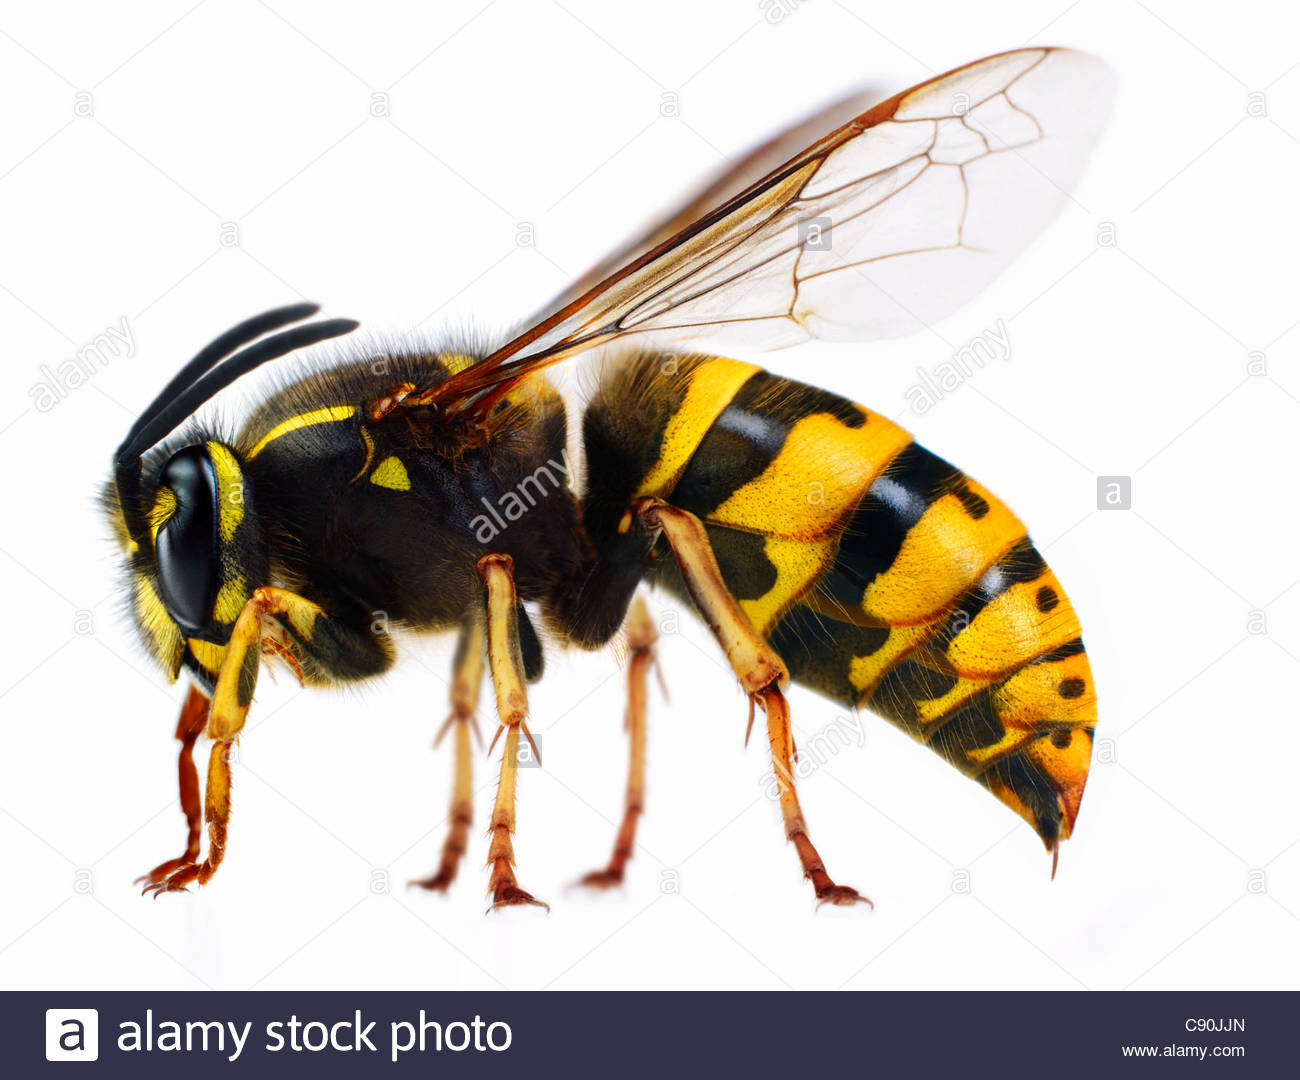 Close up of wasp - Stock Image